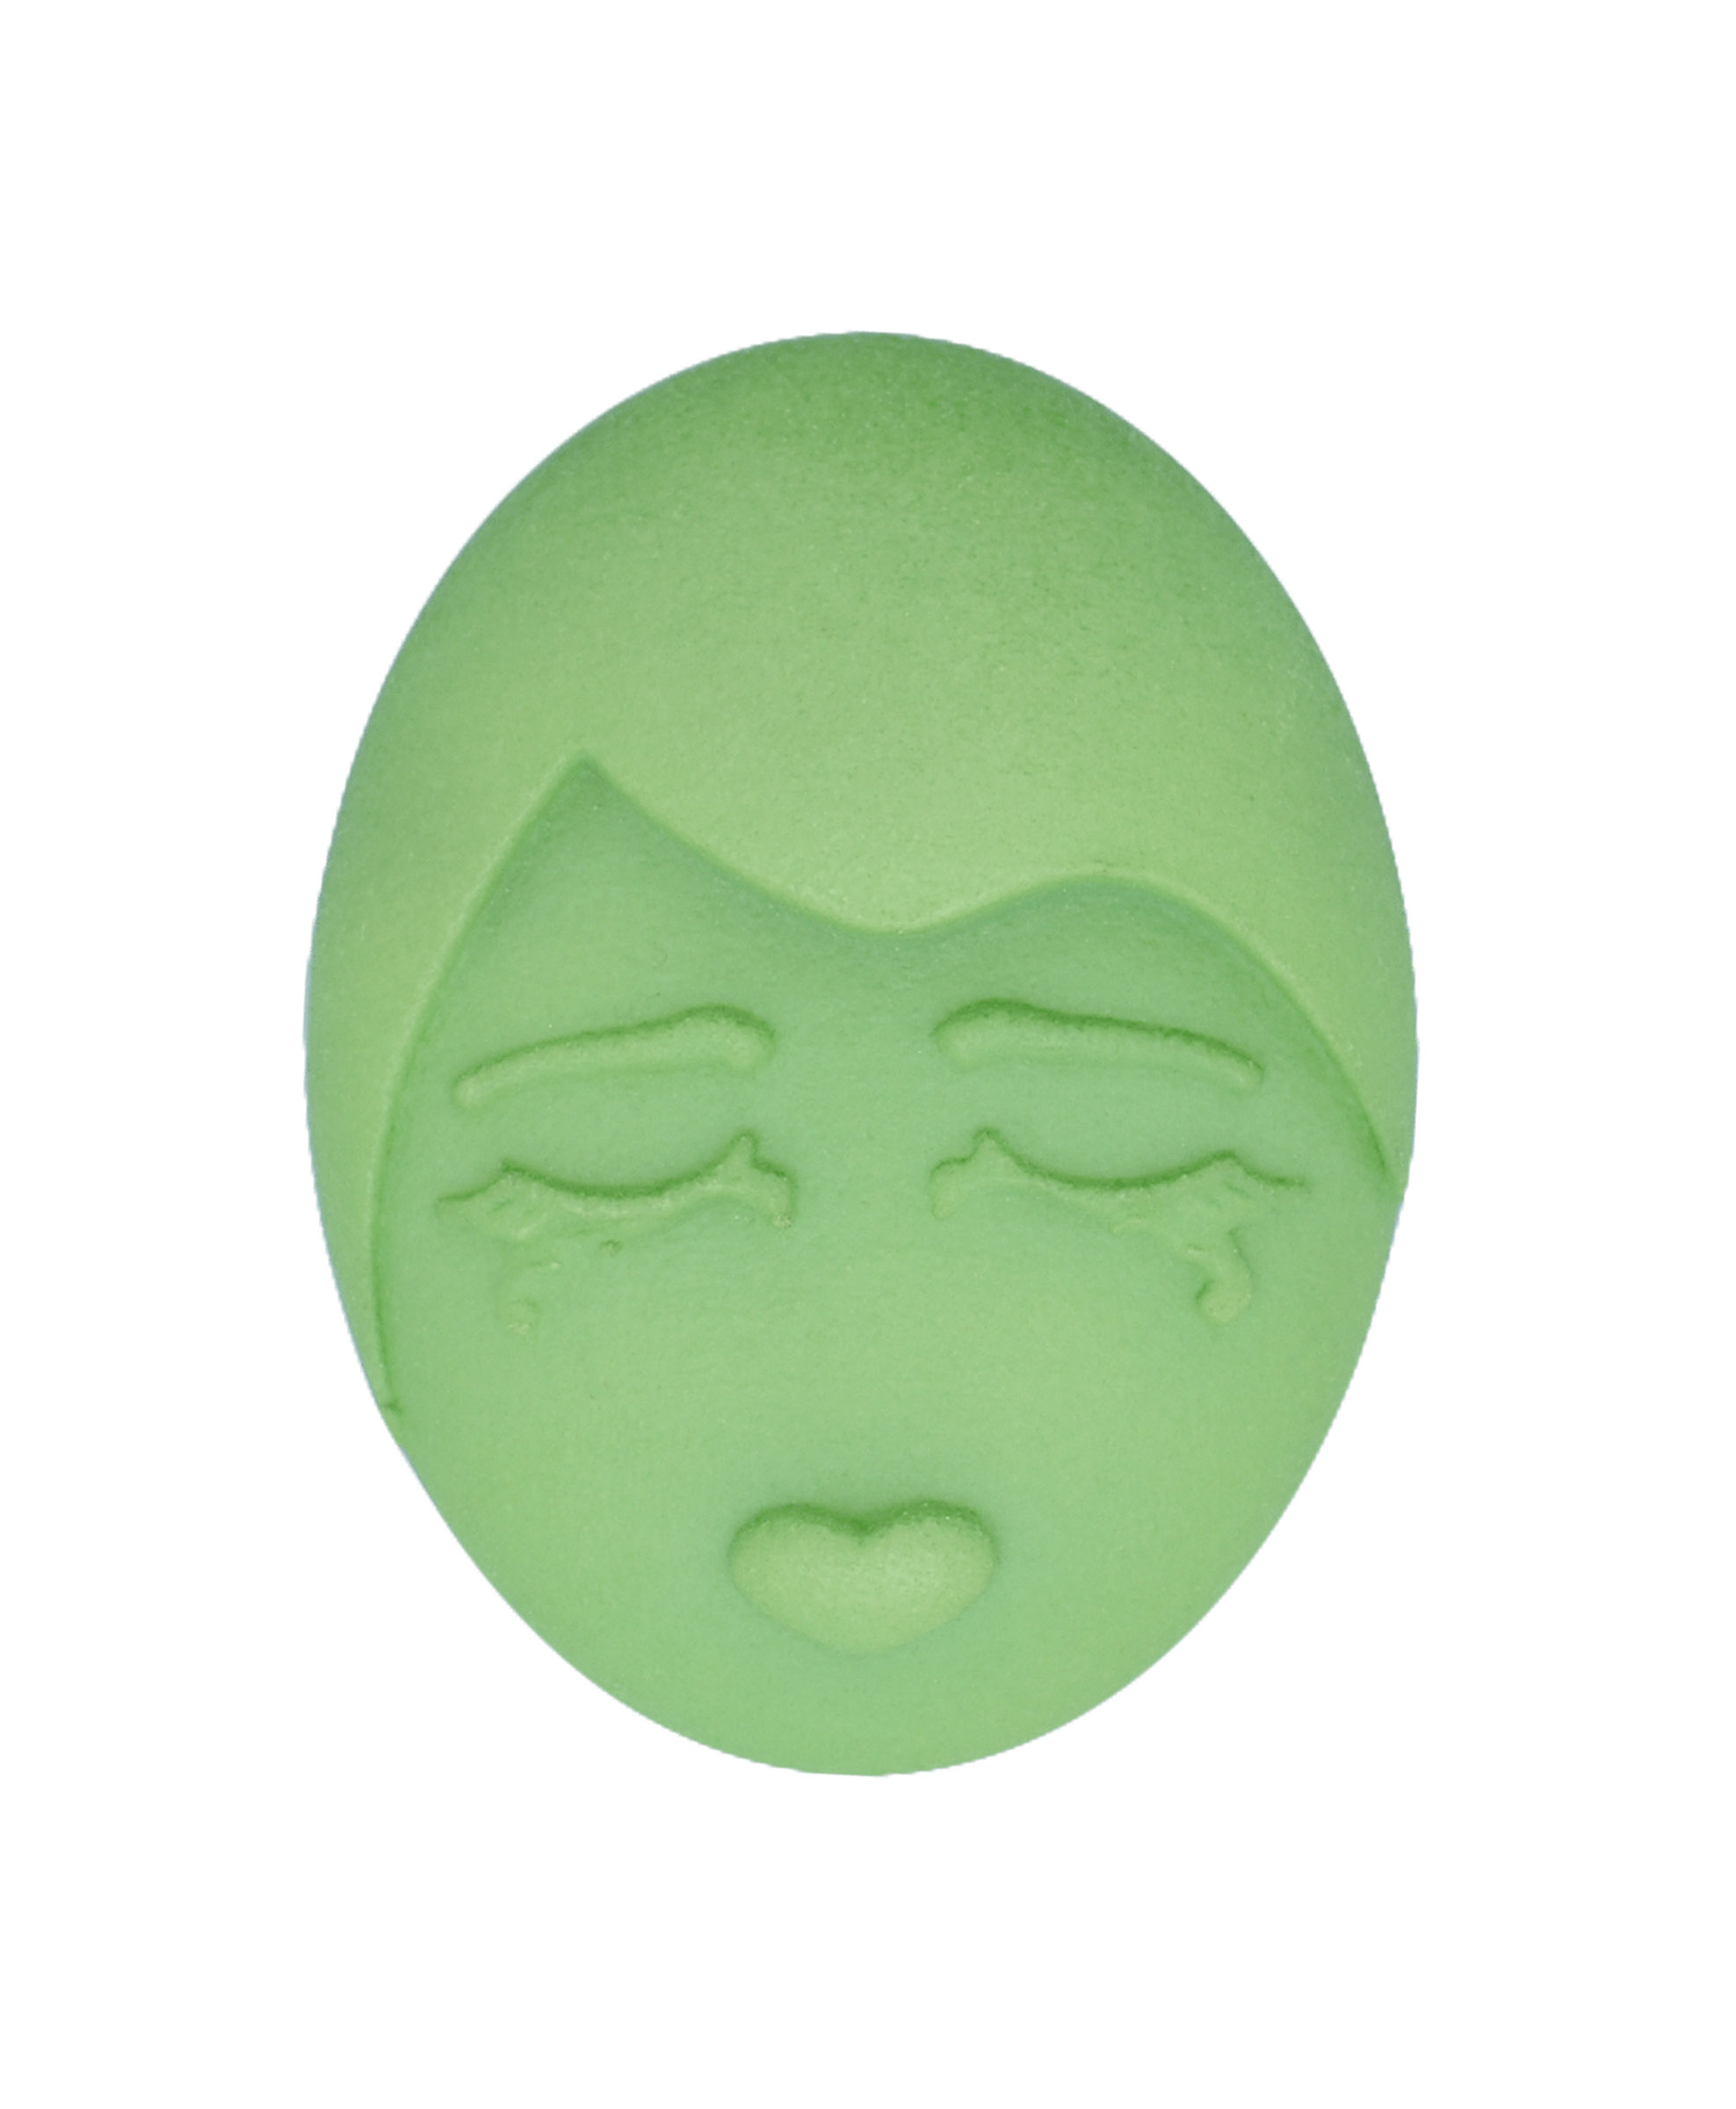 verde so sad